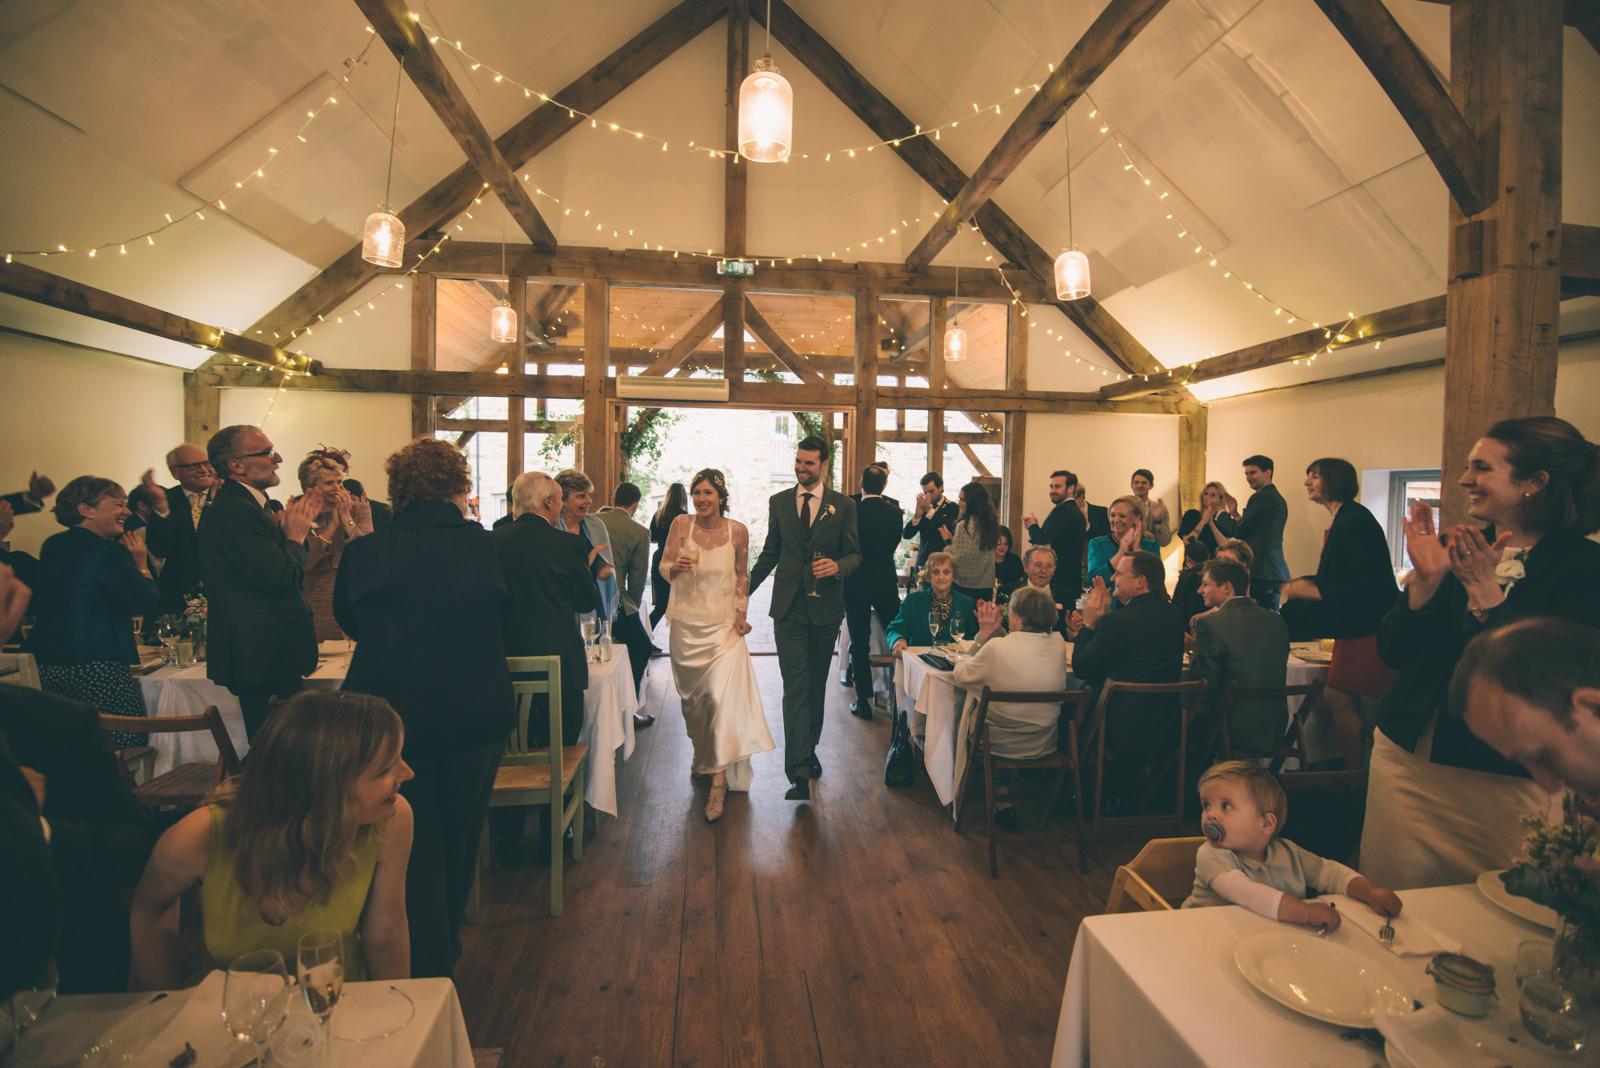 nancarrow-wedding-photography-120.jpg